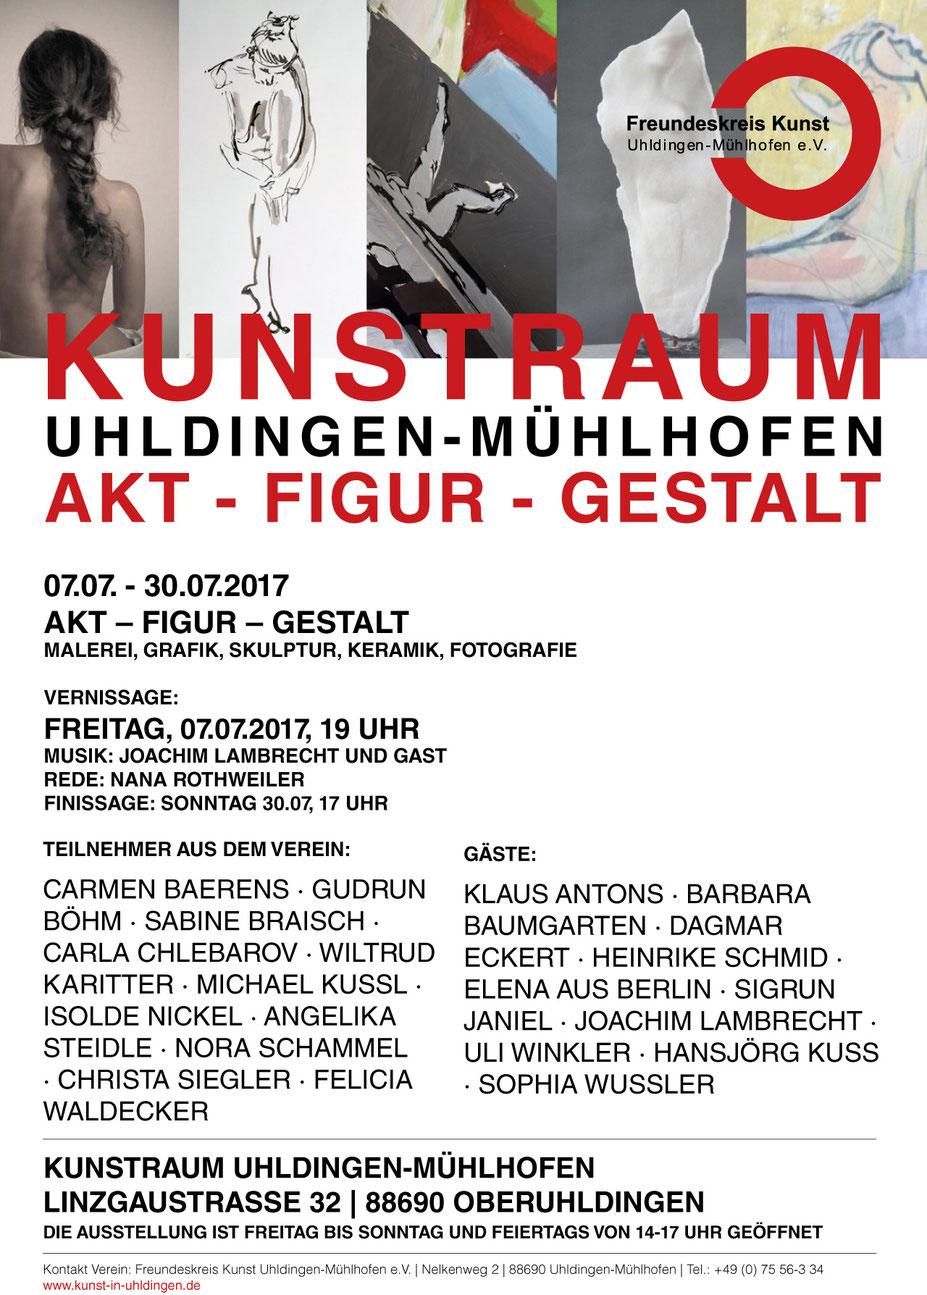 Carla Chlebarov - Akt-Figur-Gestalt Kunstraum Uhldingen Mühlhofen 2017